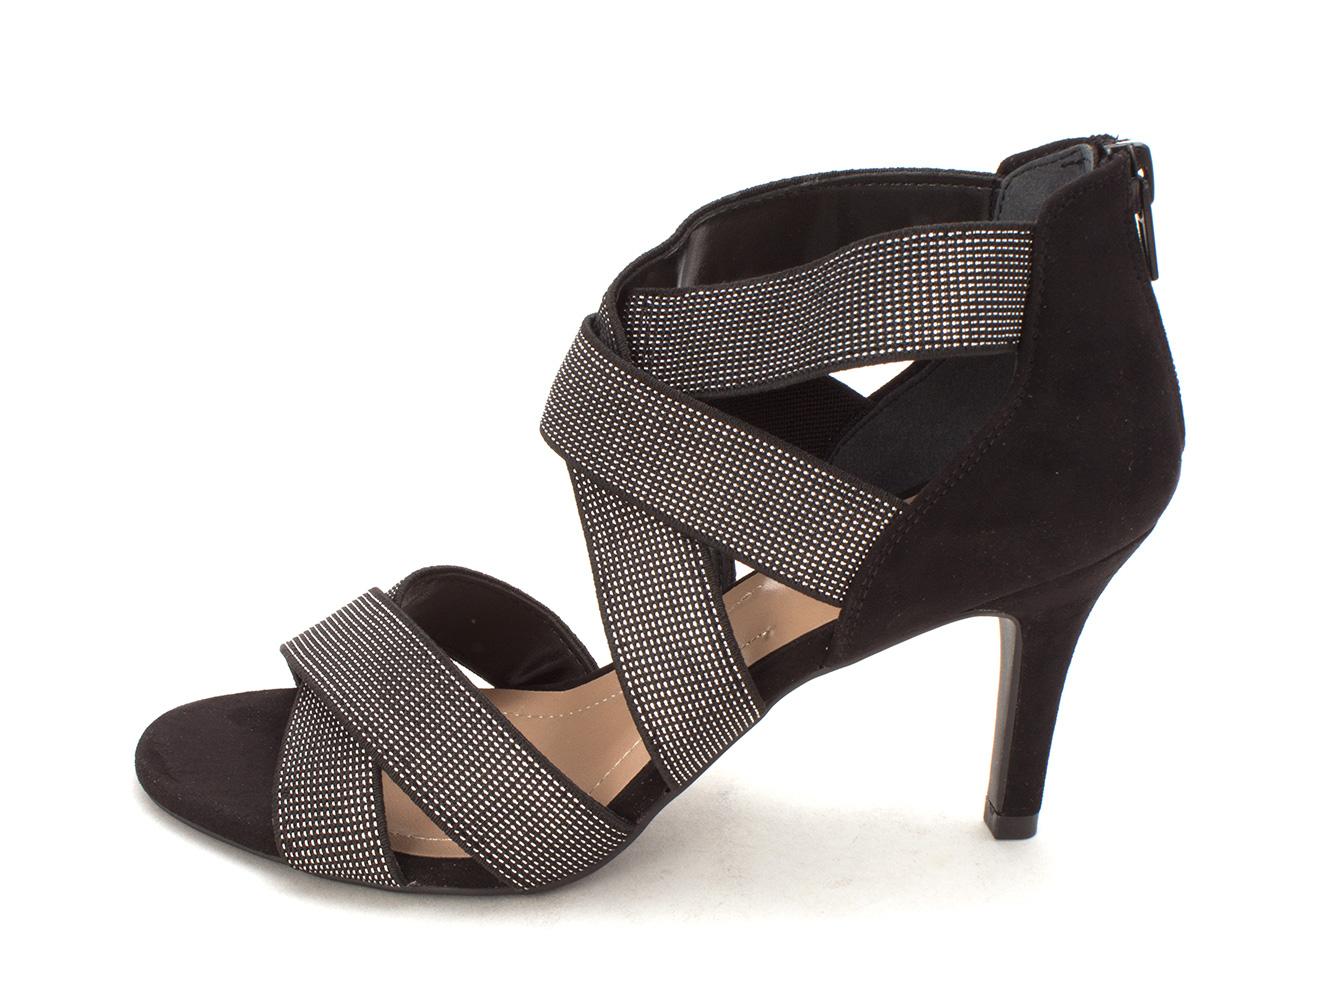 Style Co. Womens Celeste Open Toe Classic Pumps Black Size 6.0